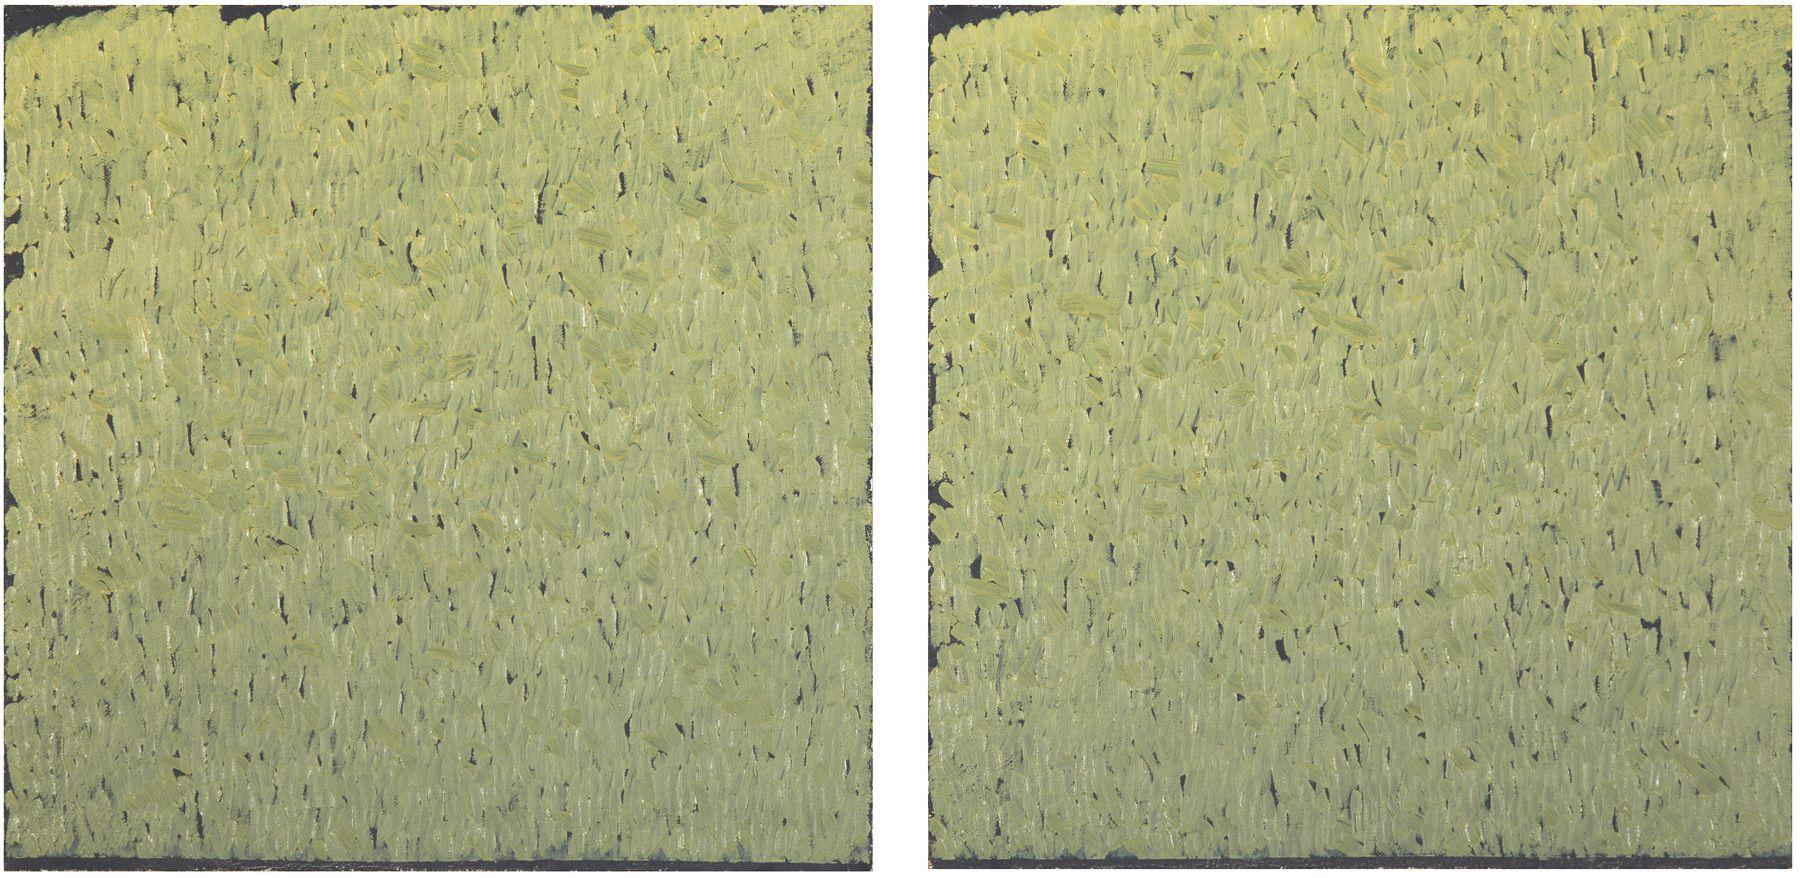 New Light Locks Gallery Warren Rohrer Of Yellow 4